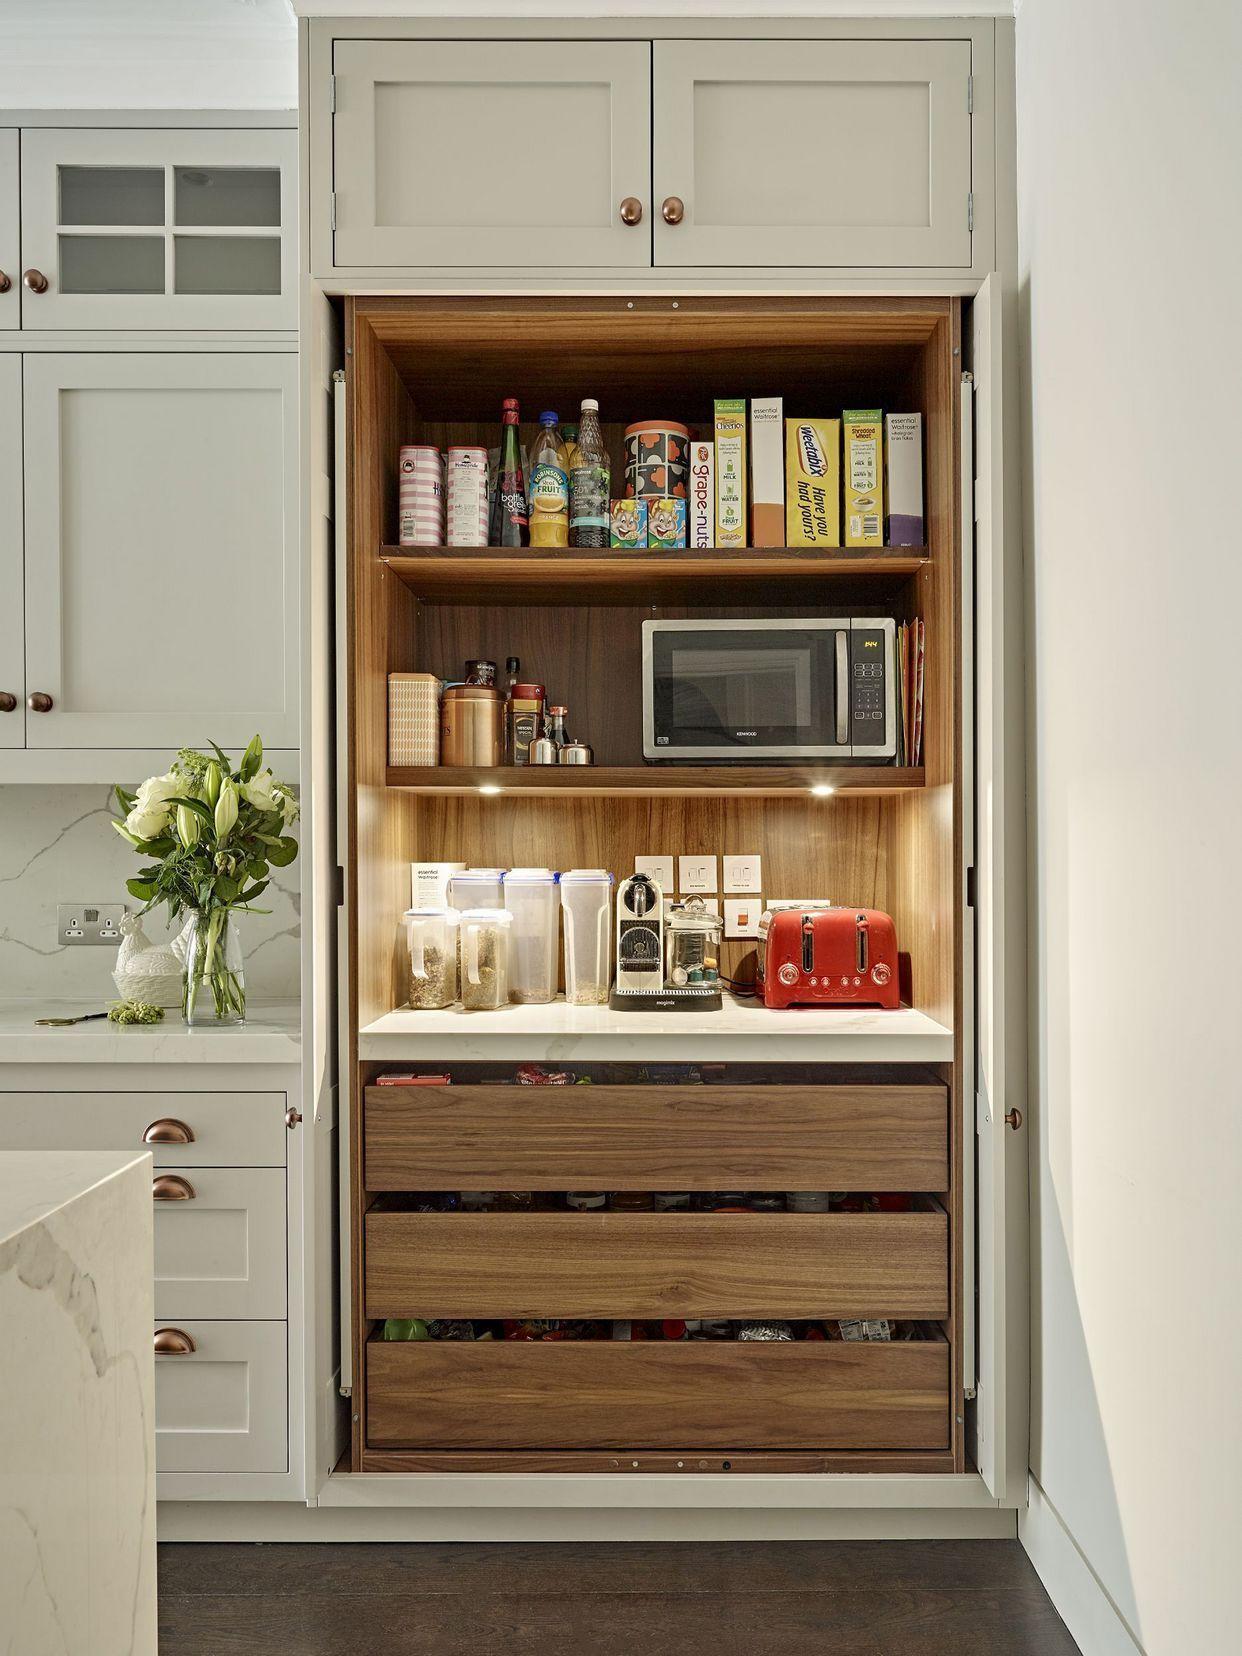 Rangement Petit Dejeuner Cuisine mountain fixer upper: the final kitchen layout & cabinet